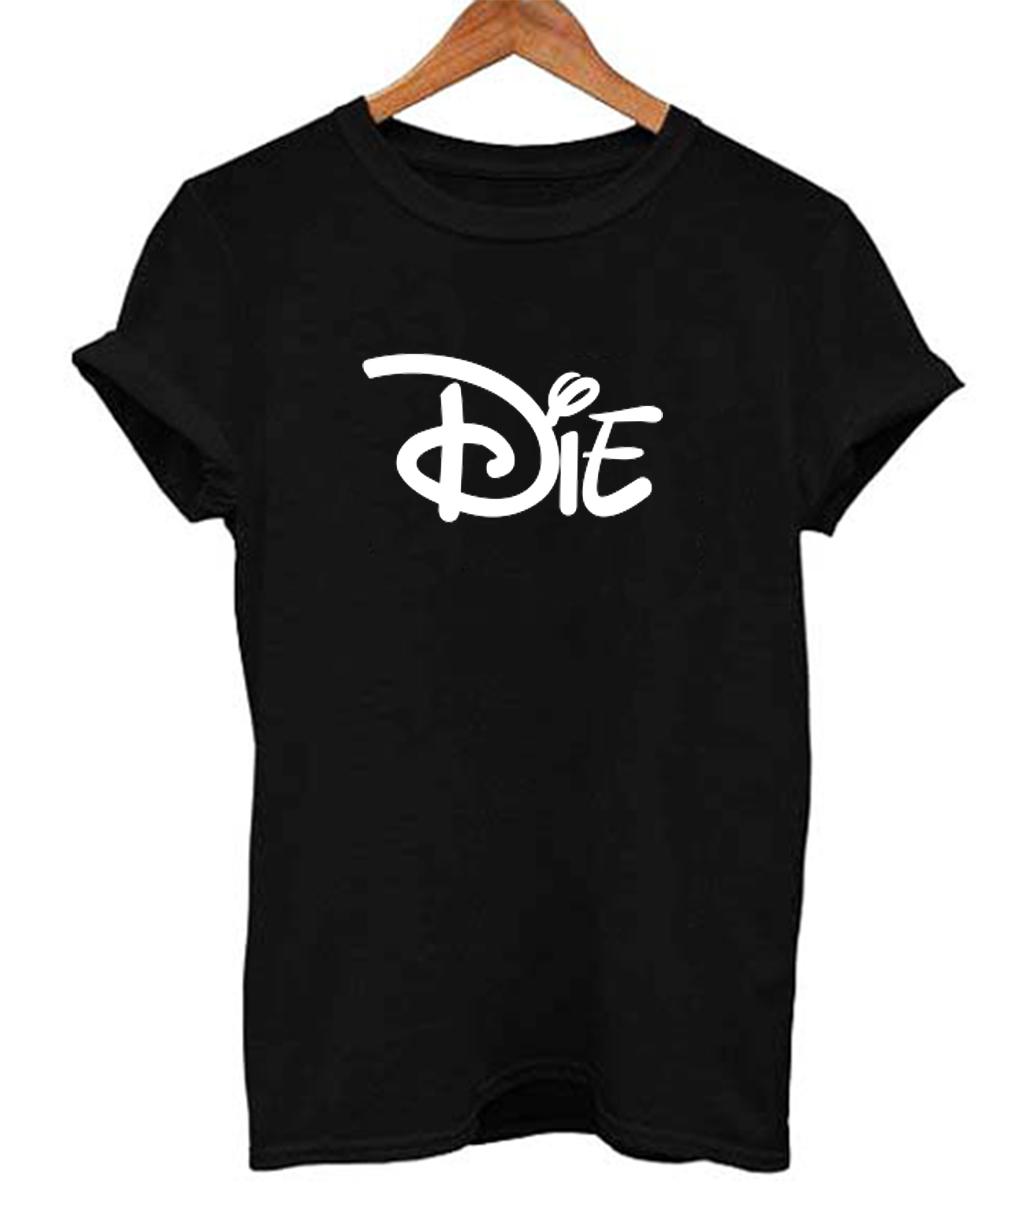 Die Cartoon Movies Funny Men's Women's T Shirt